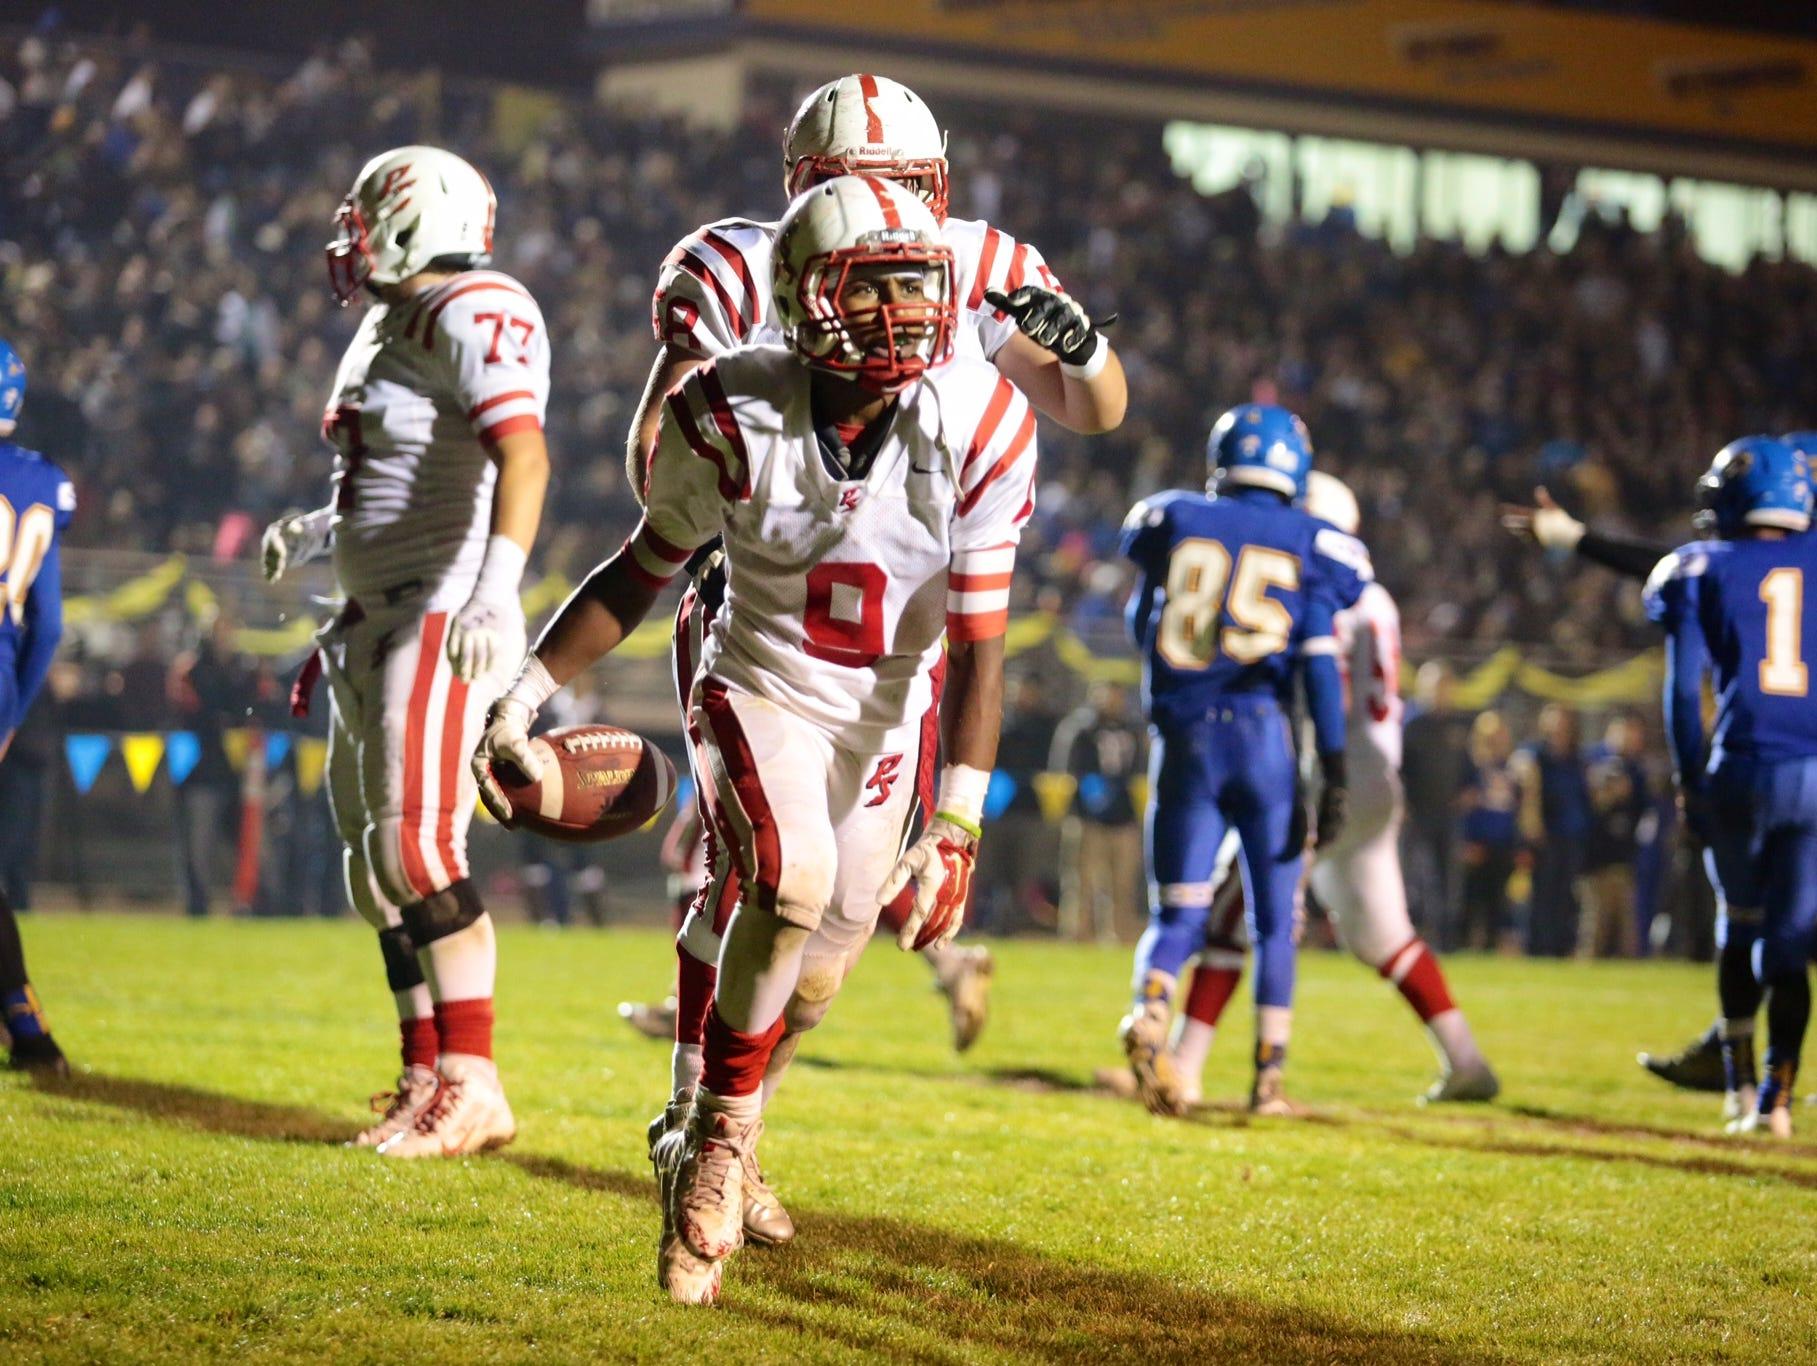 The Palm Springs High School football team has that championship glow again.